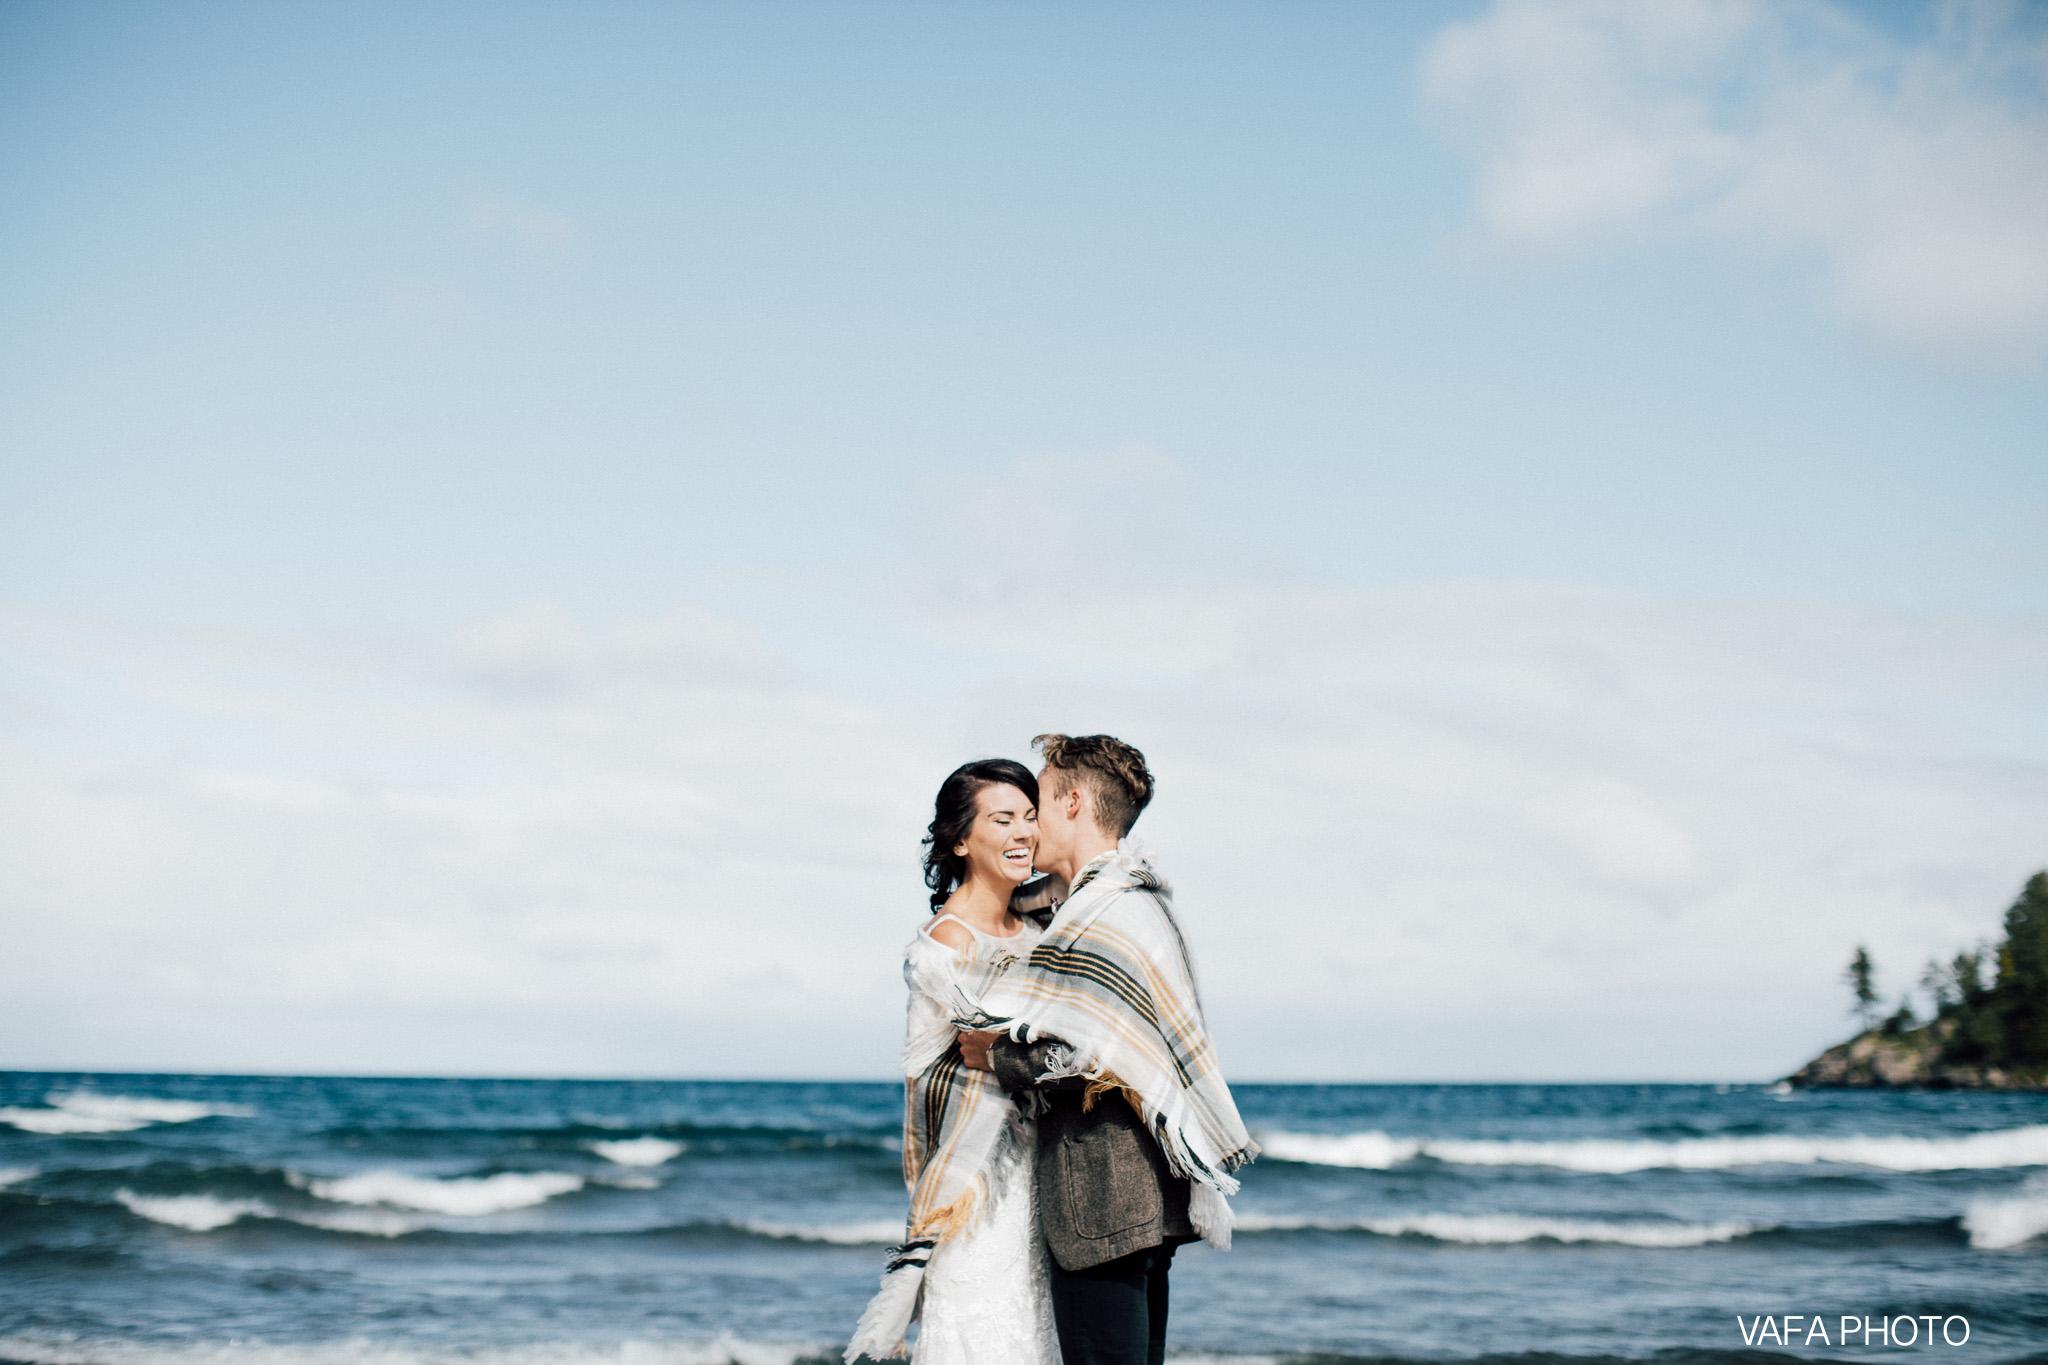 Hogback-Mountain-Wedding-Chelsea-Josh-Vafa-Photo-620.jpg